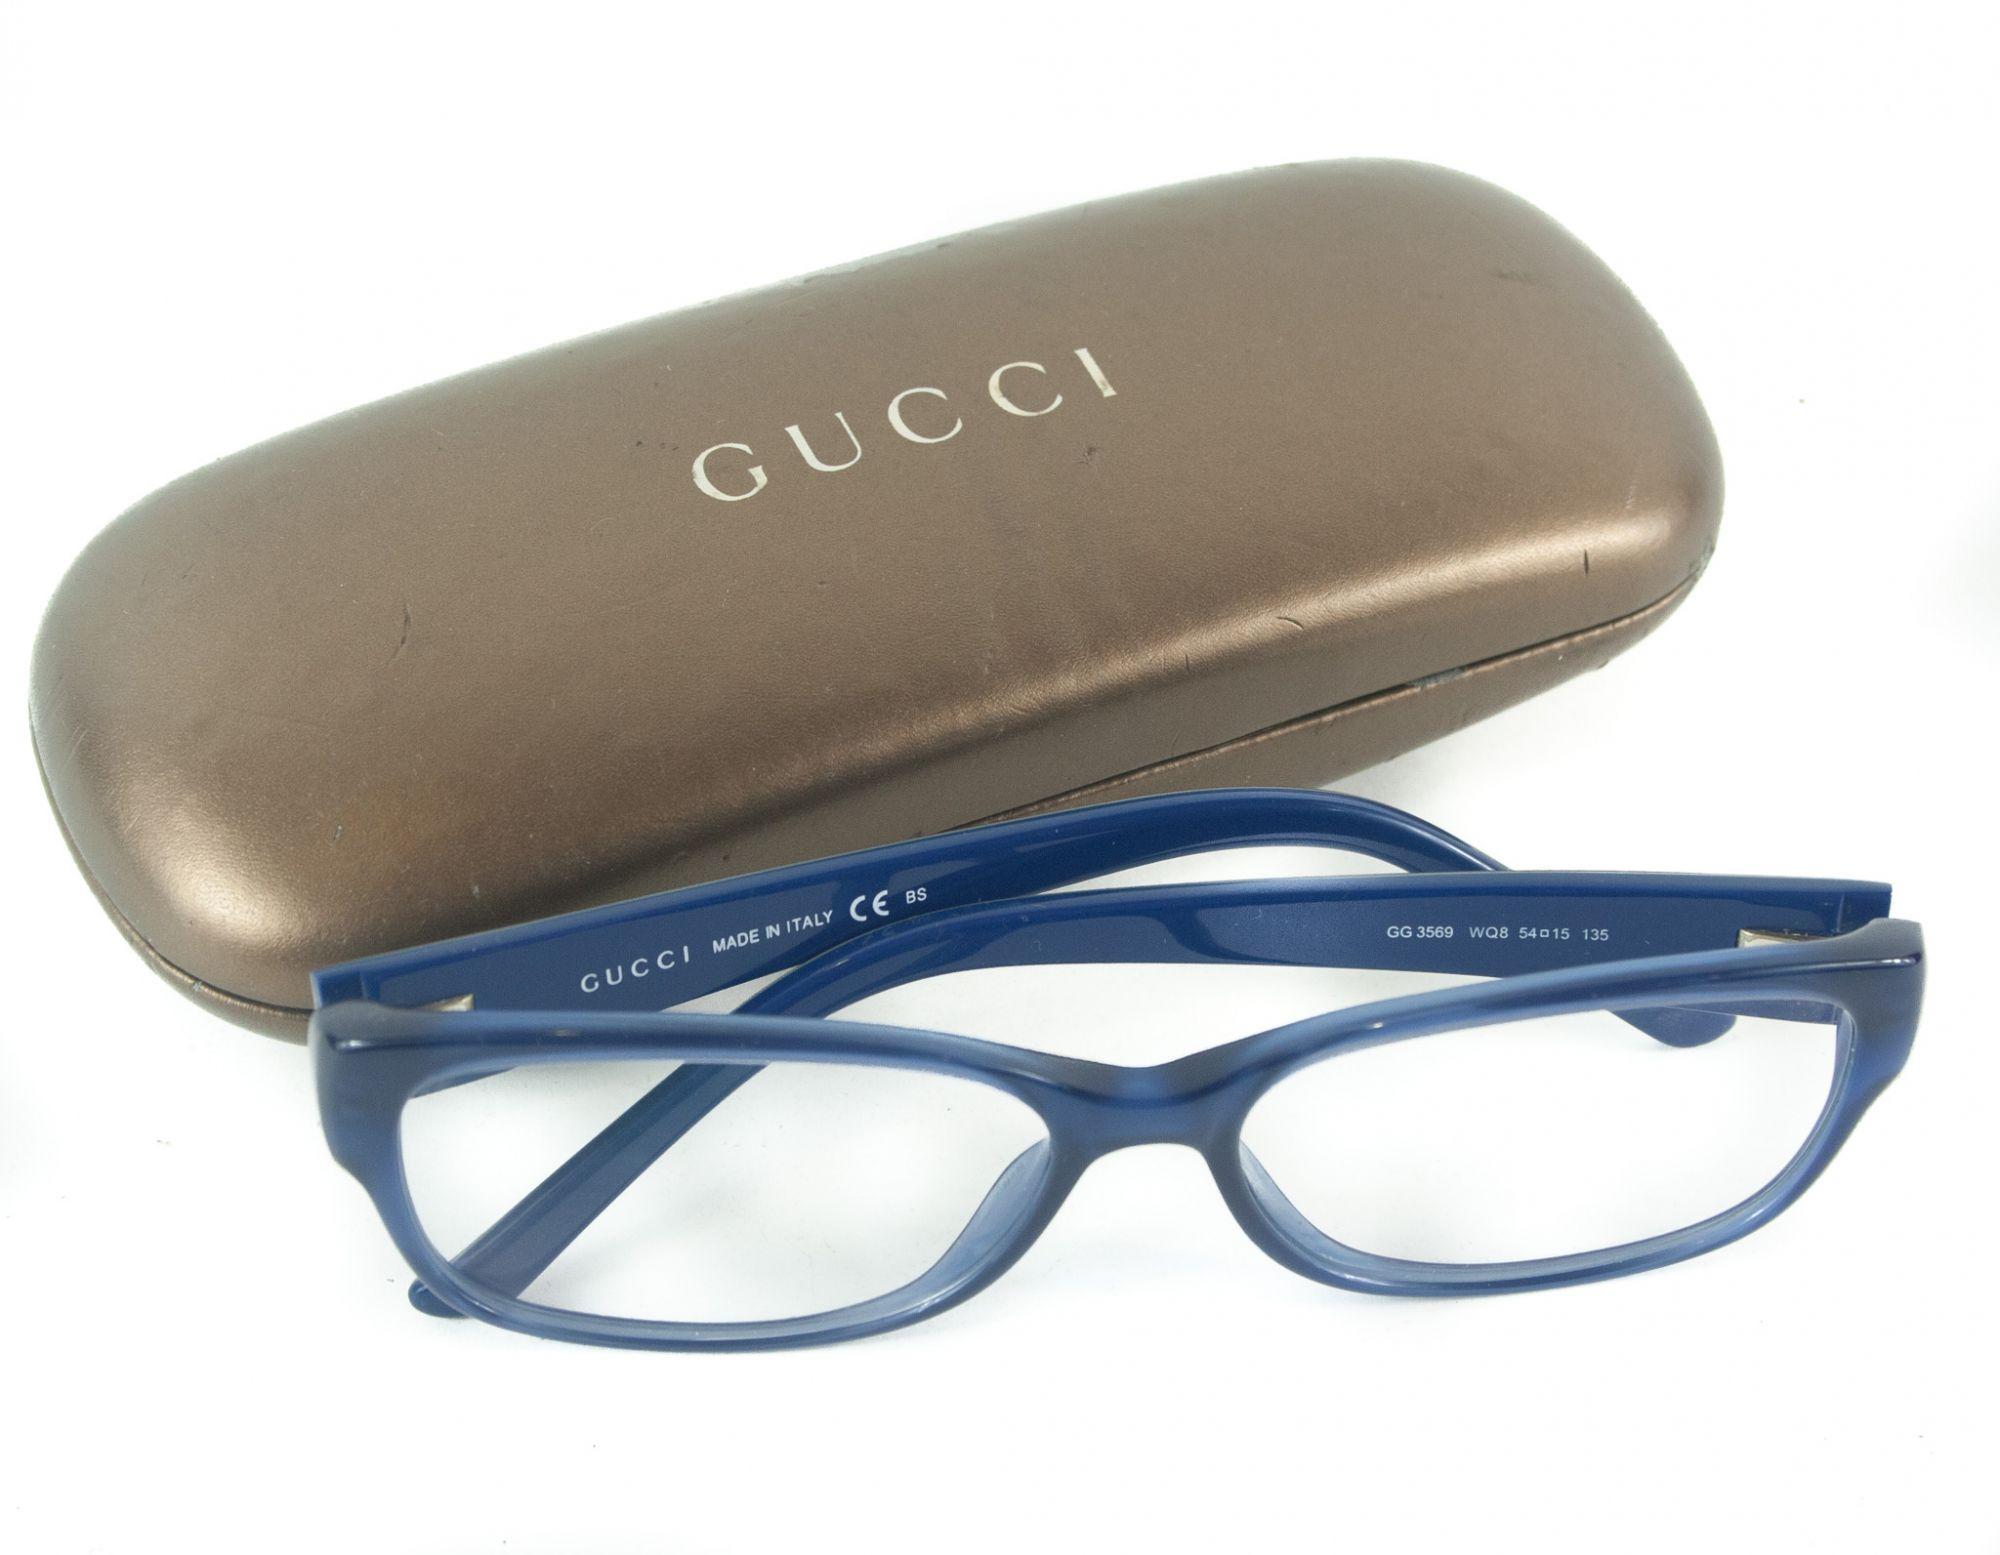 Eyeglasses Caliber